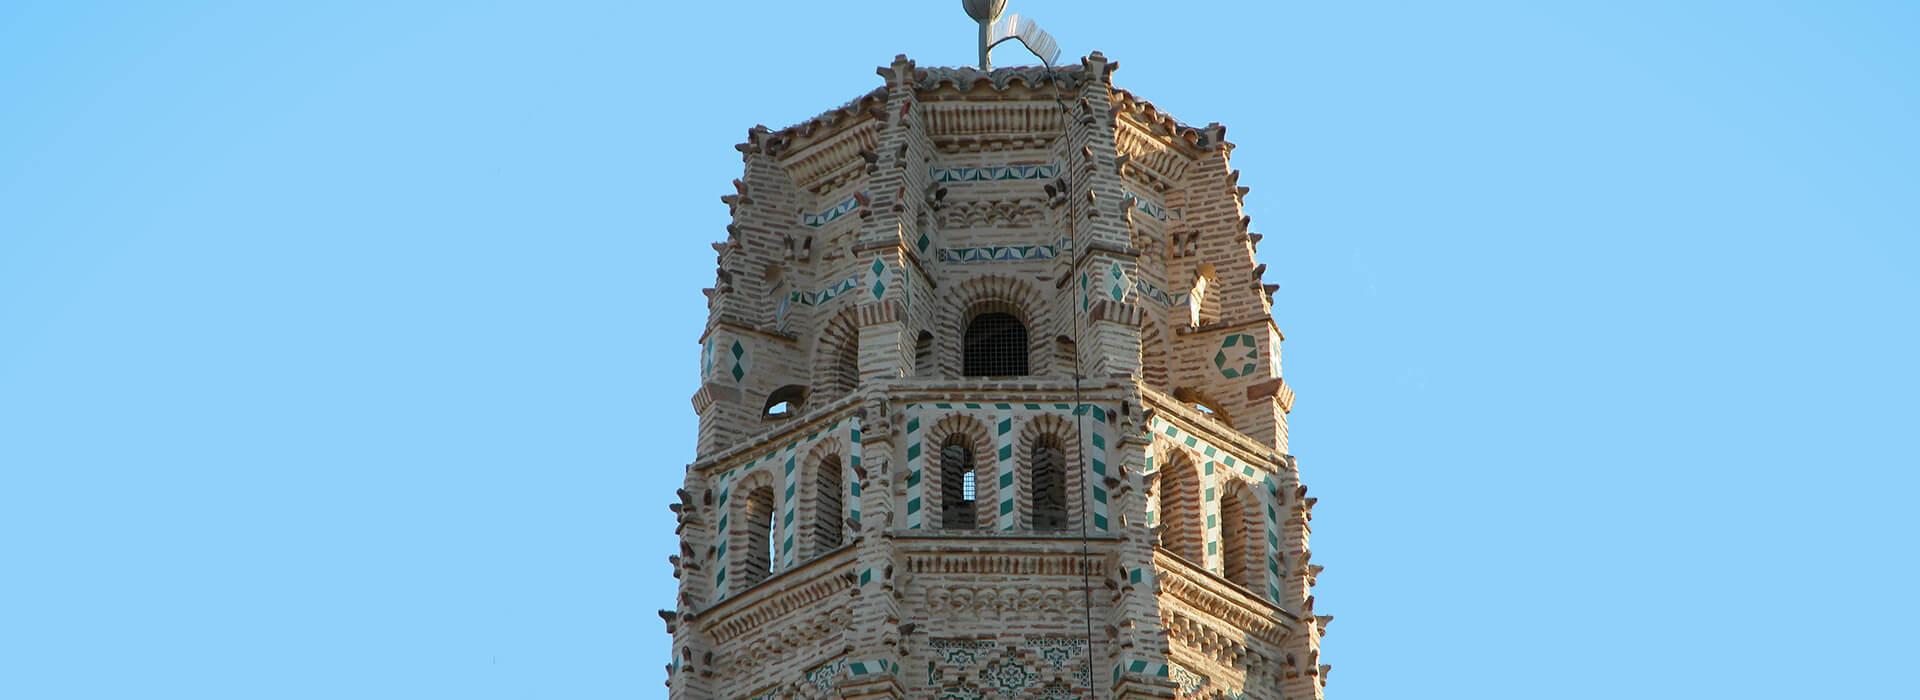 Torre - Imagen 1 - Restauración Slider - rubiomorte.com